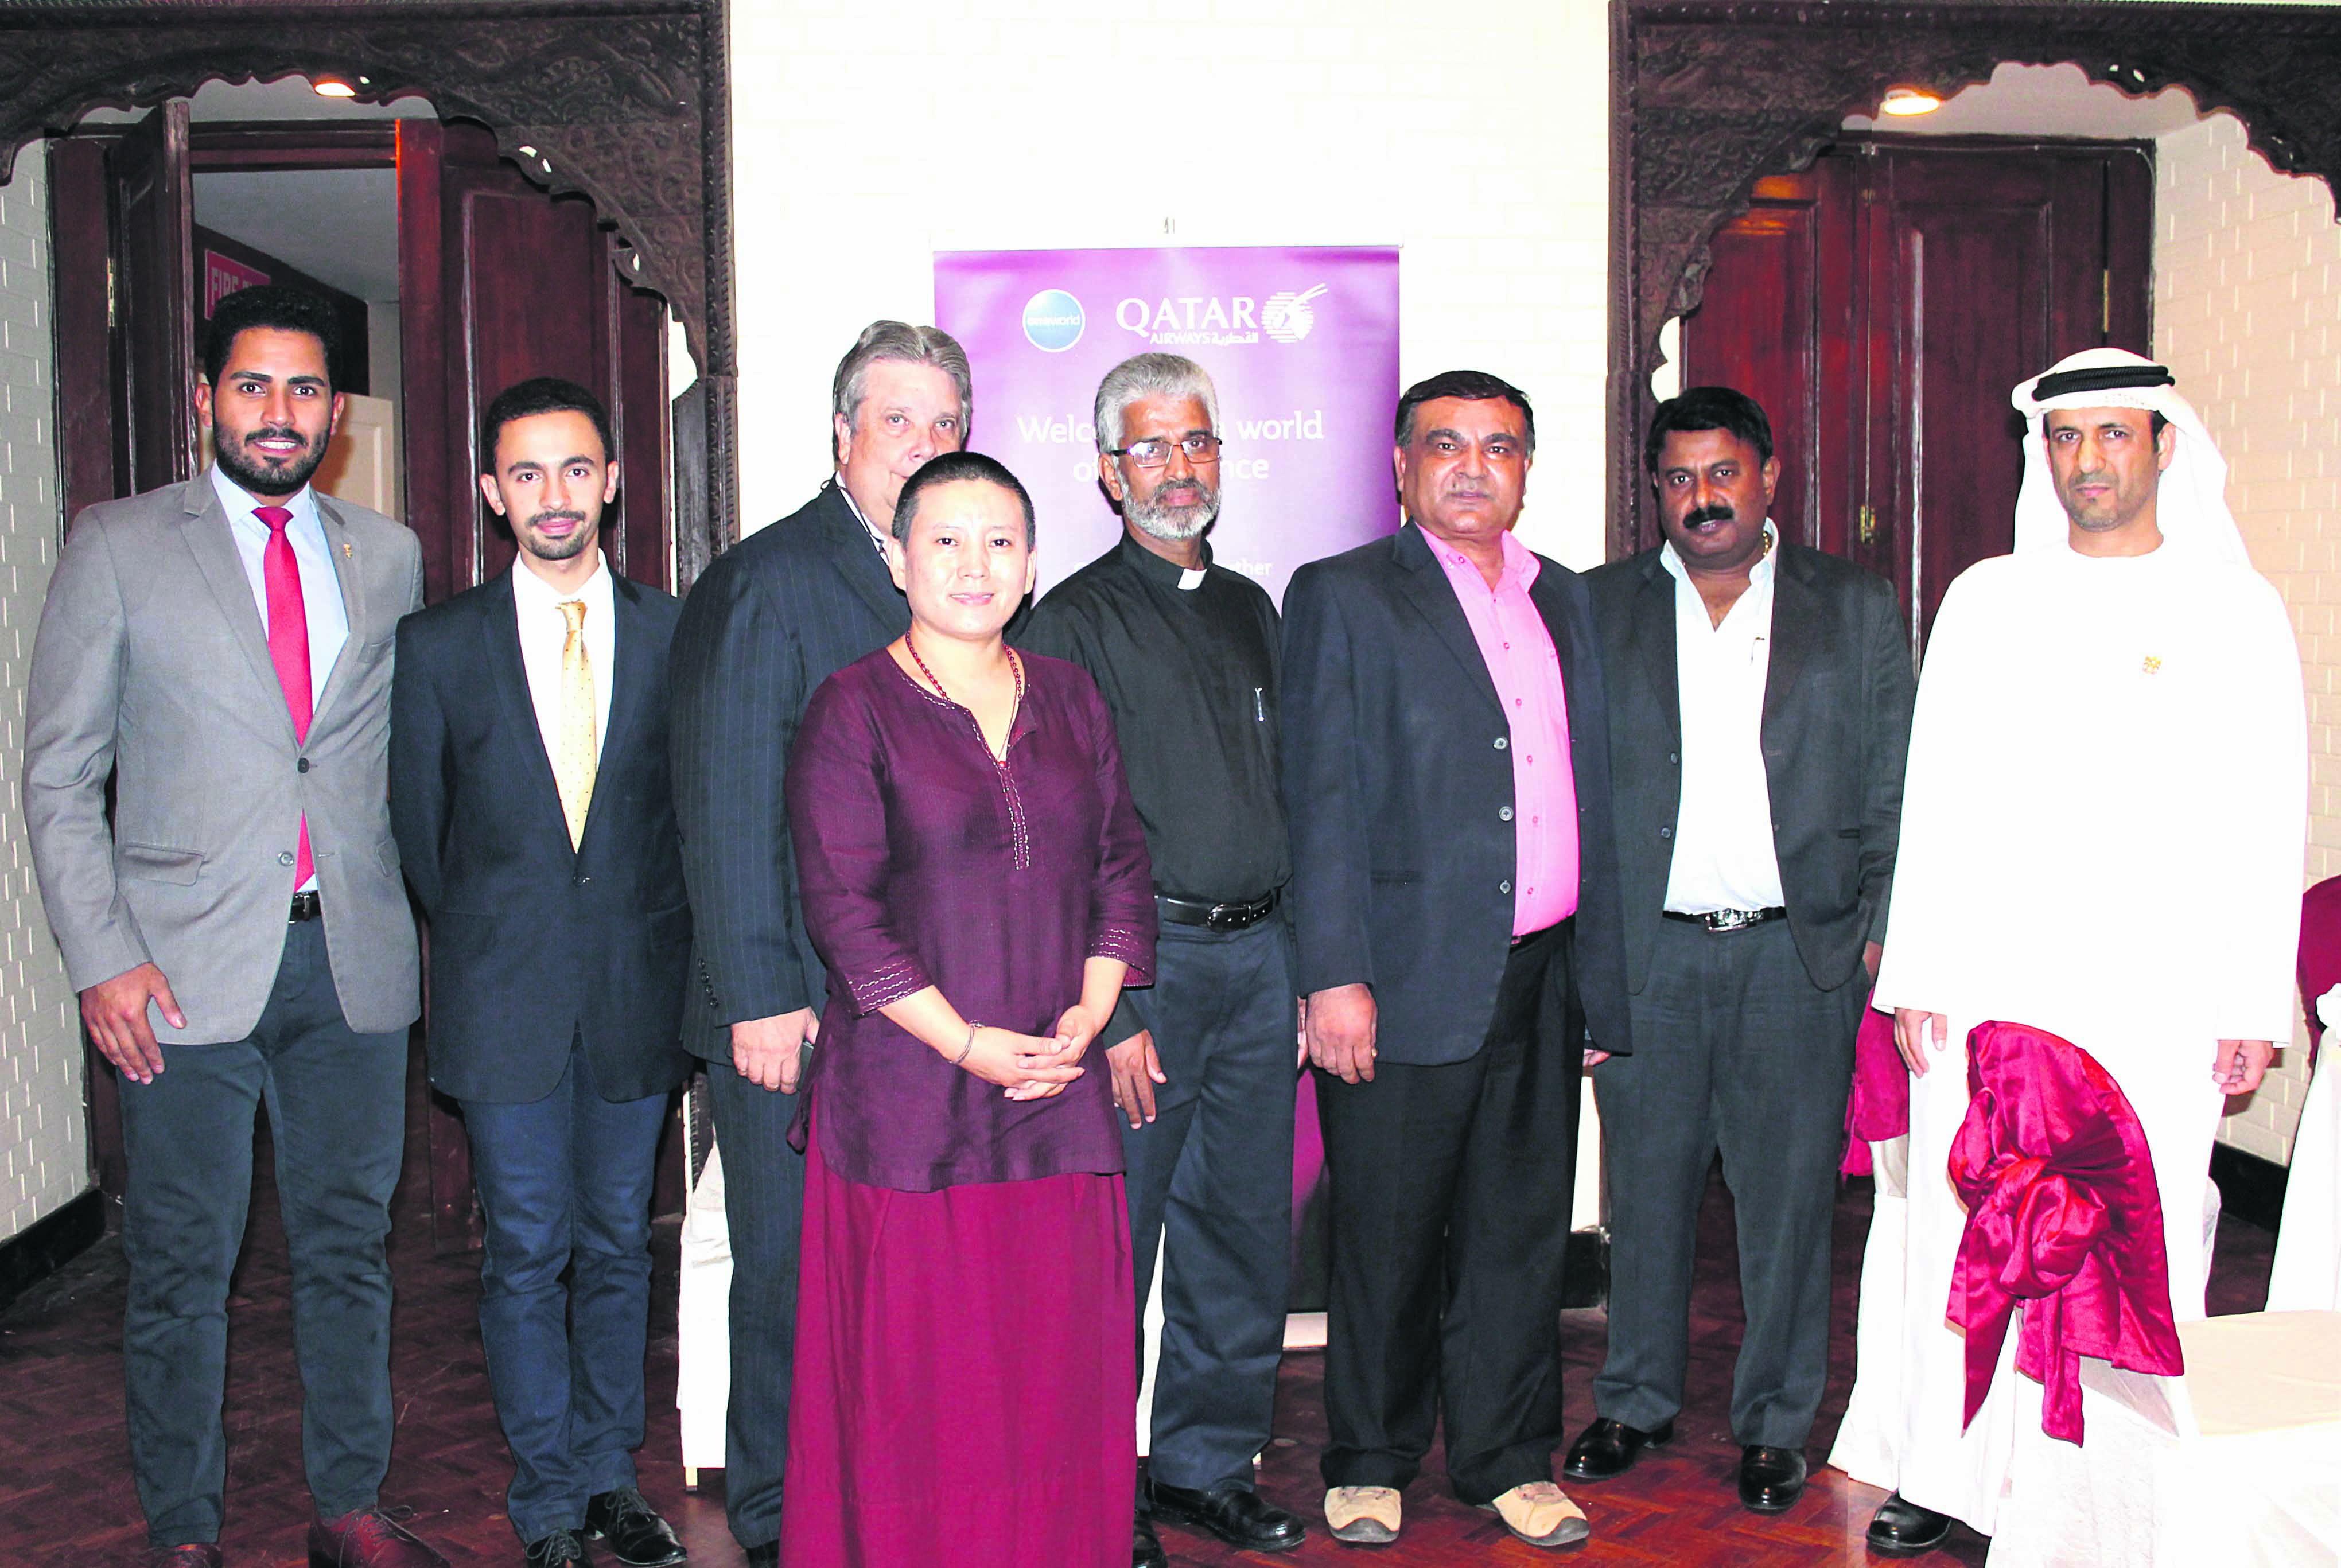 Qatar Airways hosts Ramadan dinner